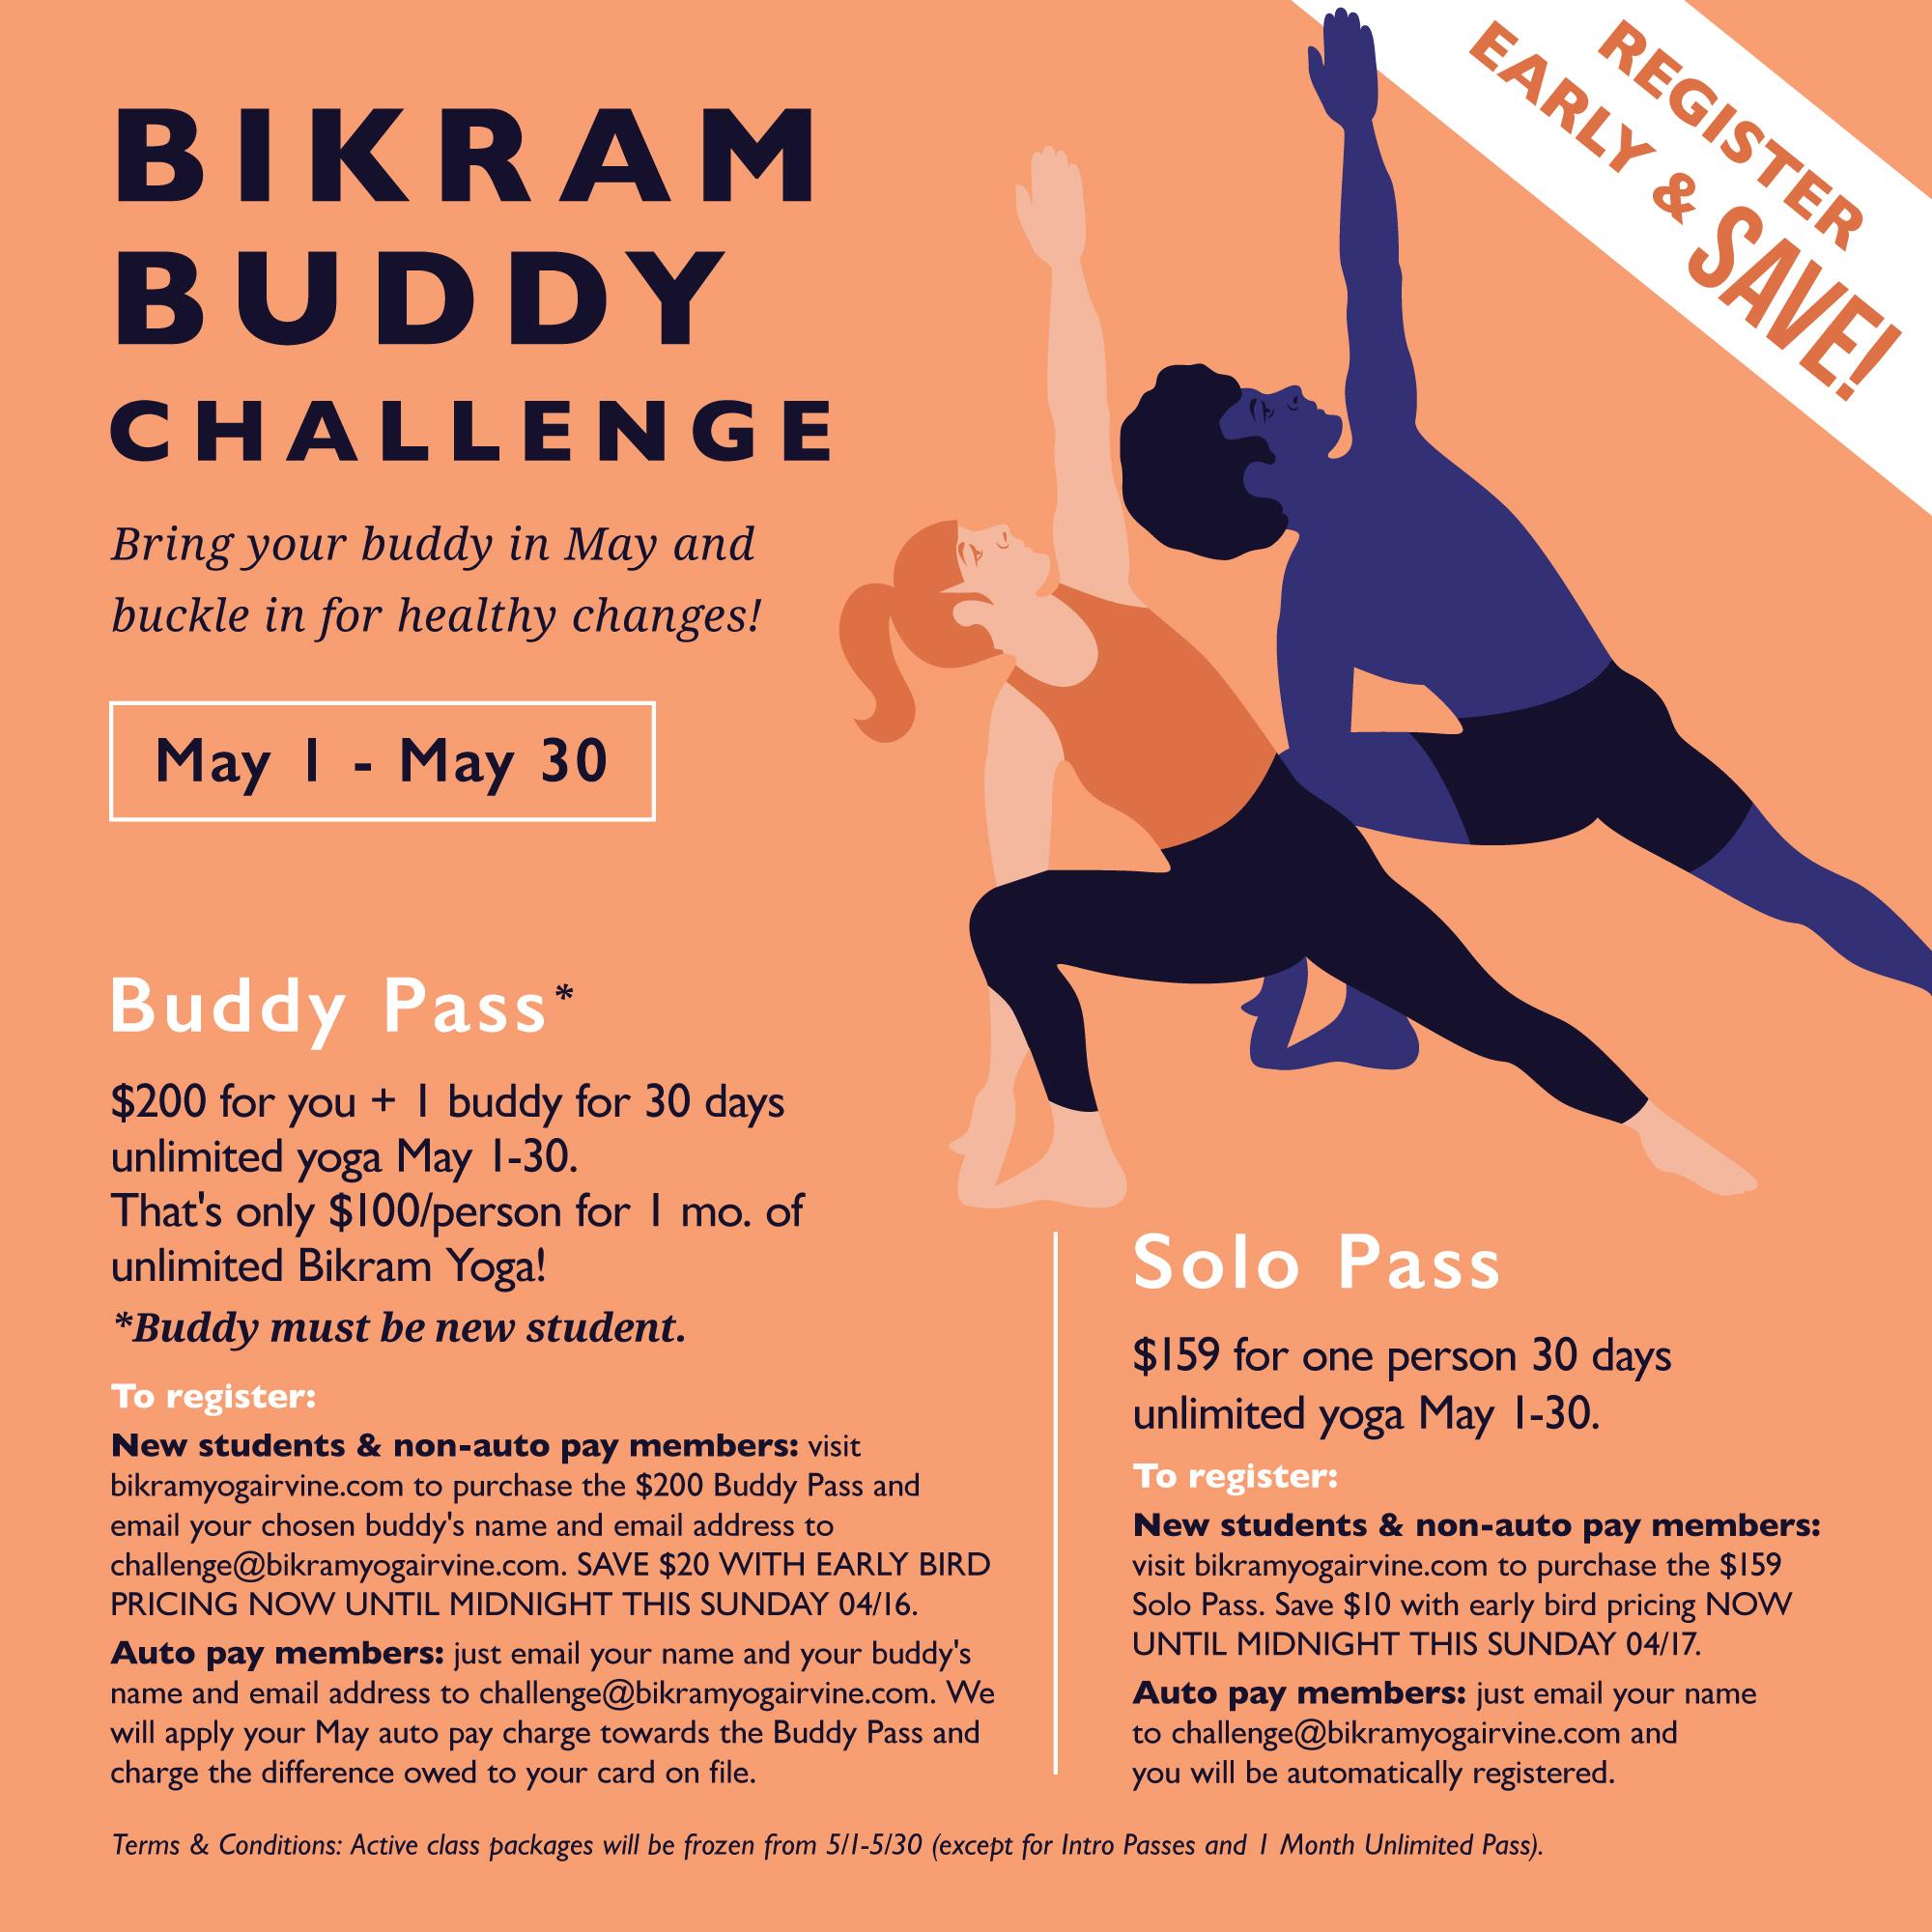 Bikram Buddy Challenge going on May 1- May 30